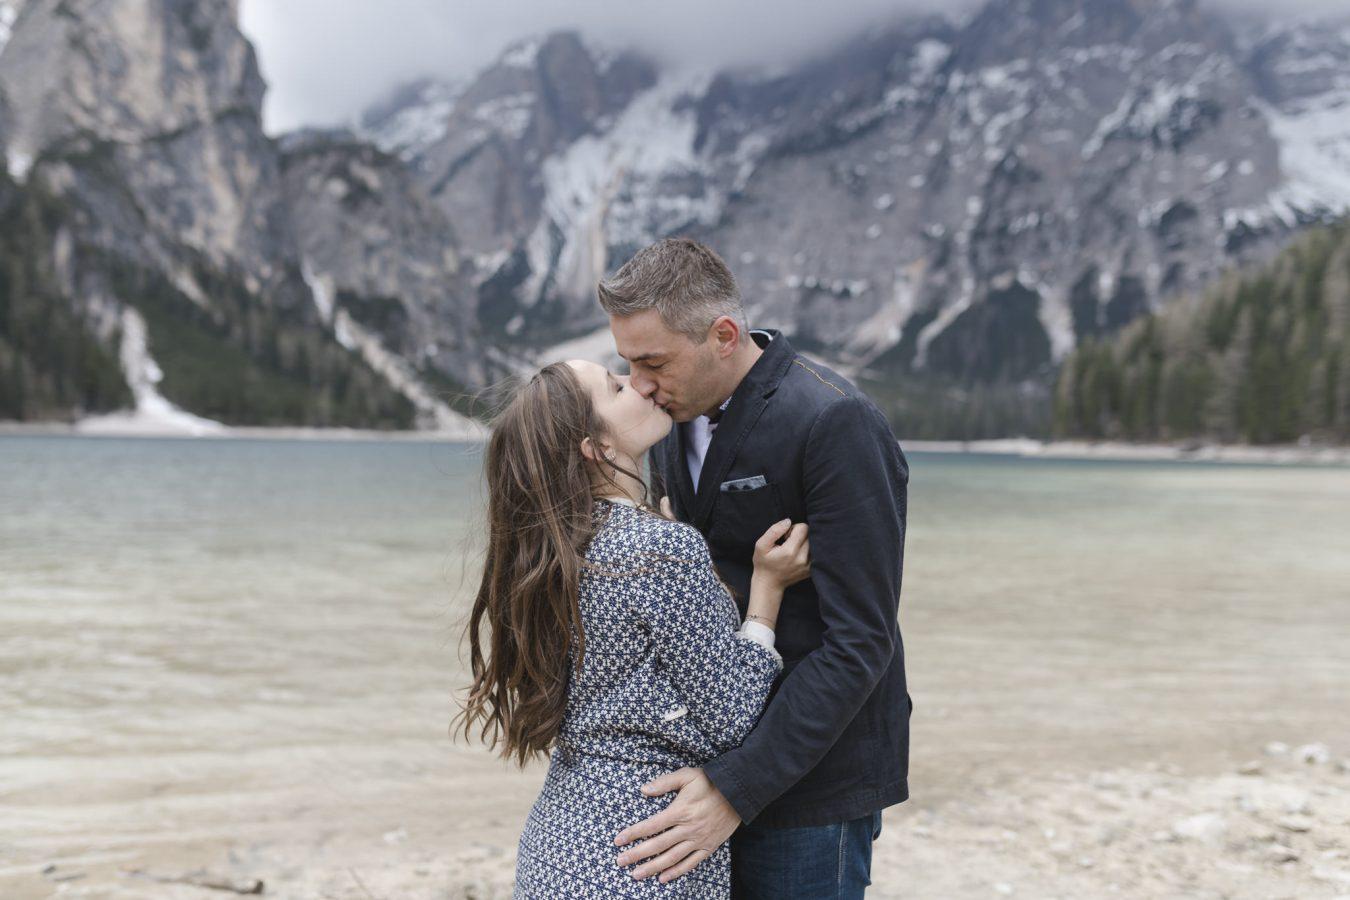 Paarshooting Hamburg - Paar küsst sich vor Bergsee in den Dolomiten